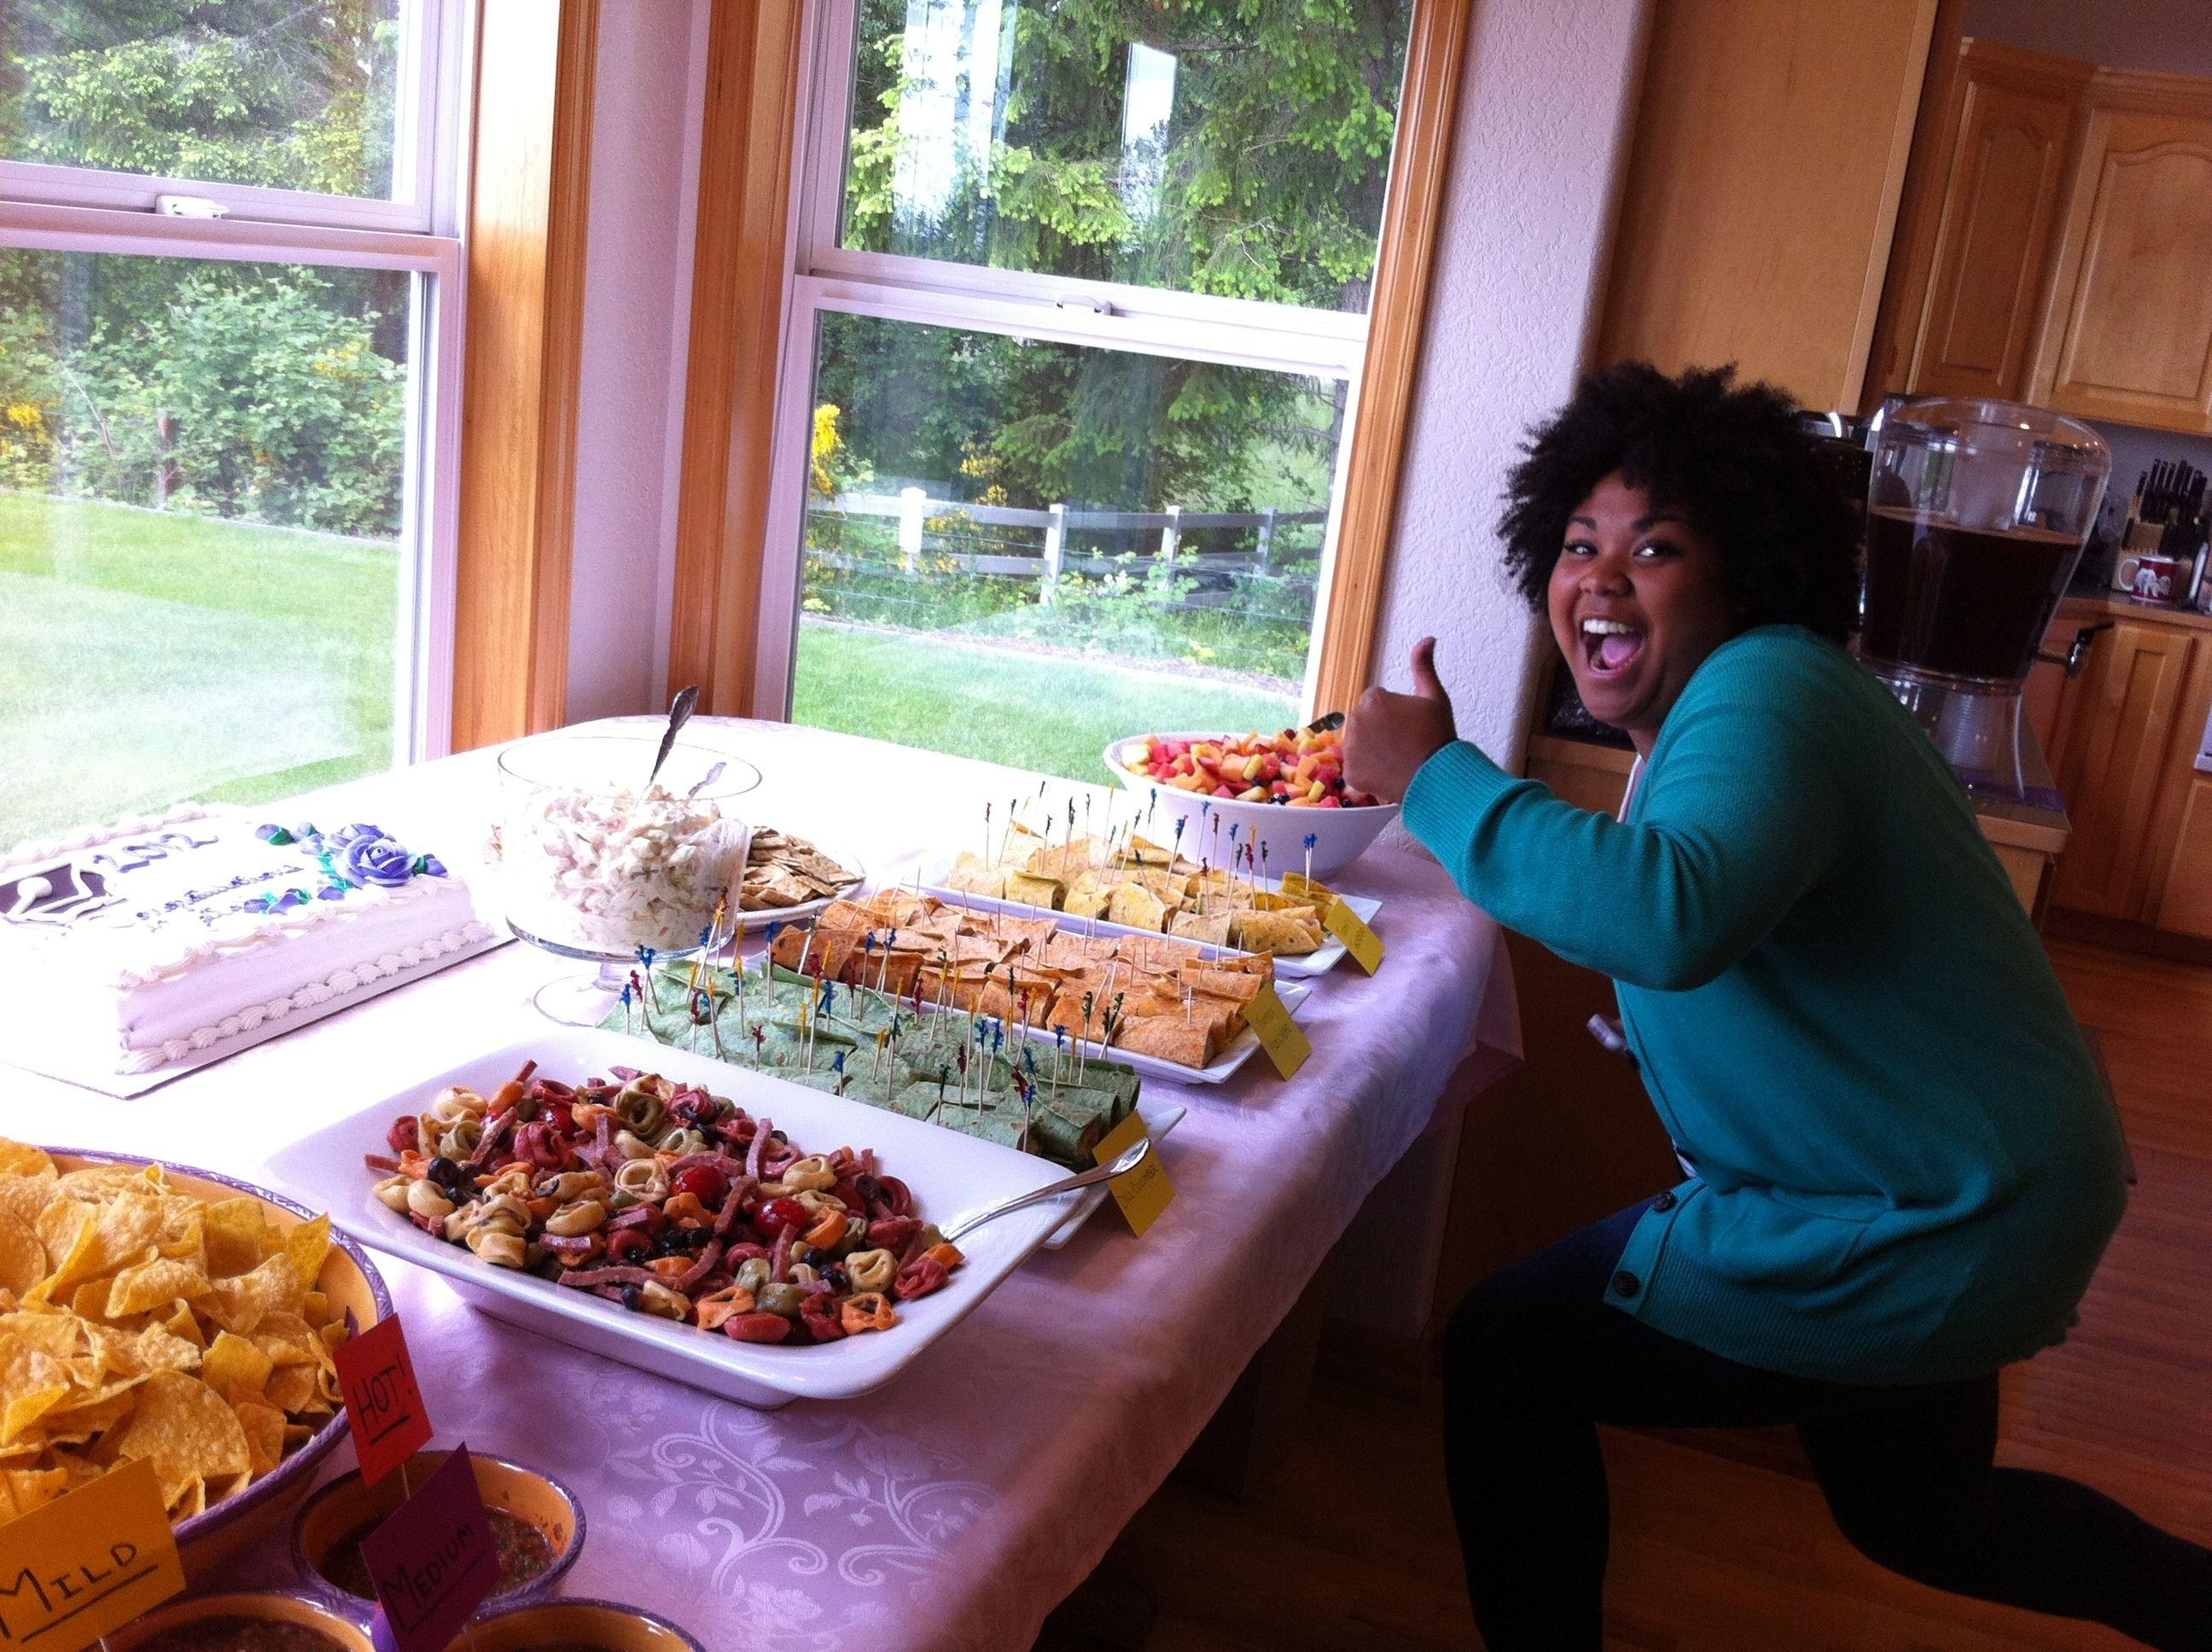 10 Stylish Graduation Open House Menu Ideas the open house food high school graduation ideas pinterest 1 2020